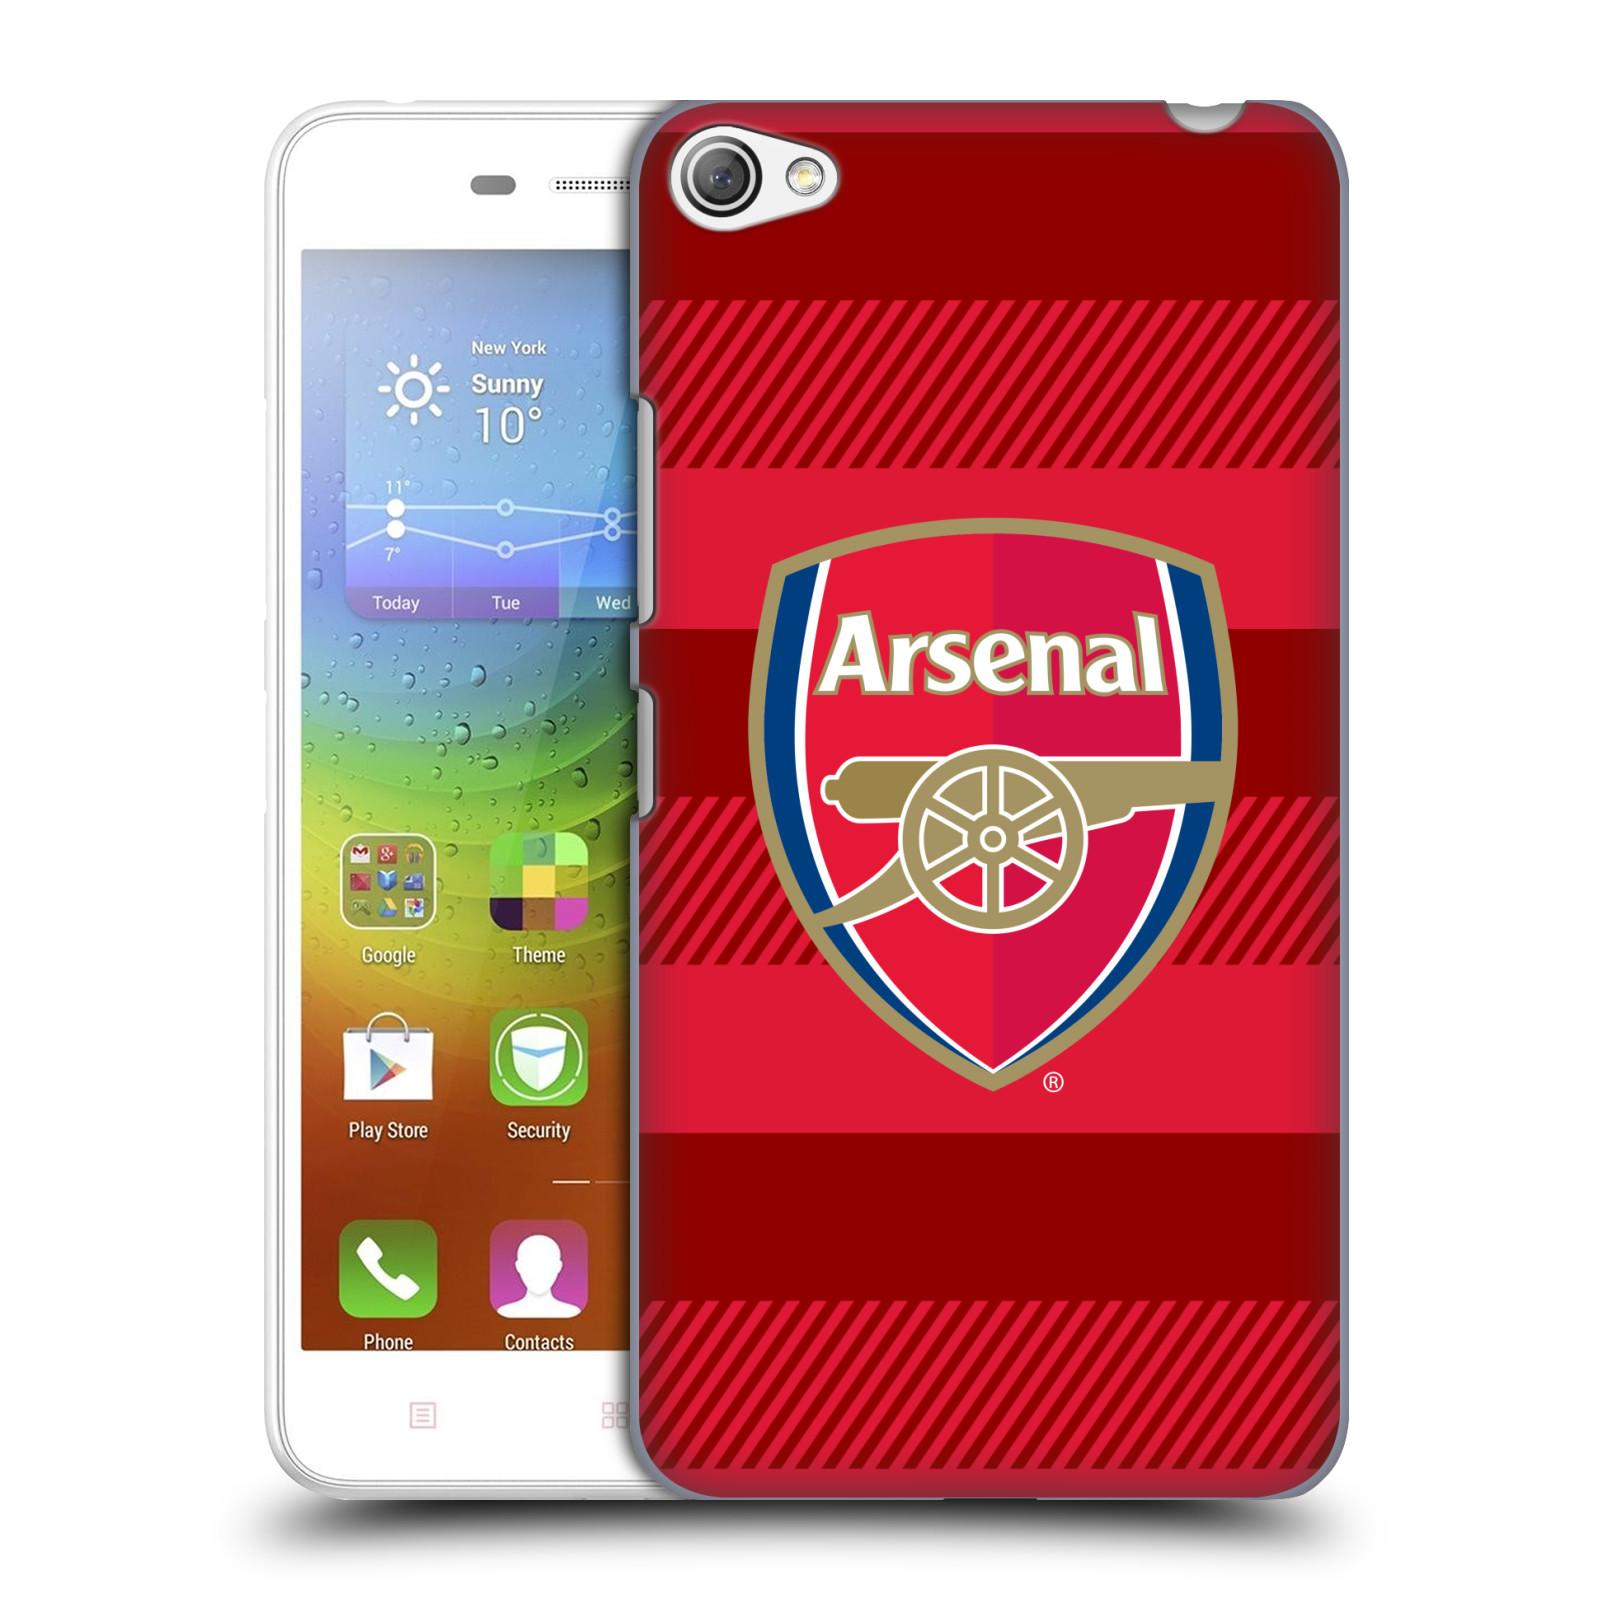 Plastové pouzdro na mobil Lenovo S60 - Head Case - Arsenal FC - Logo s pruhy